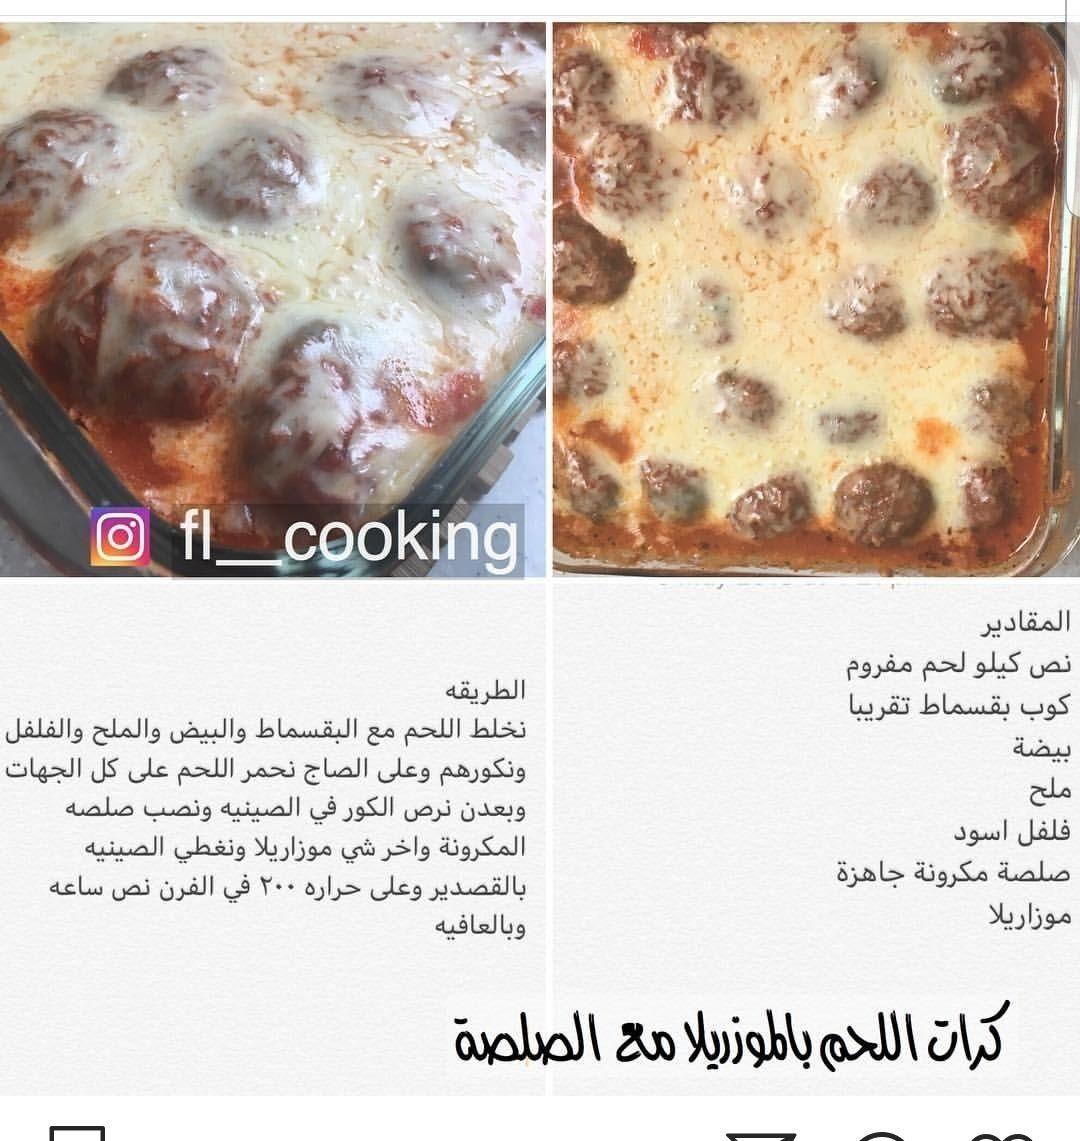 Pin By Aa123456 On Arabic Food Food Arabic Food Cooking